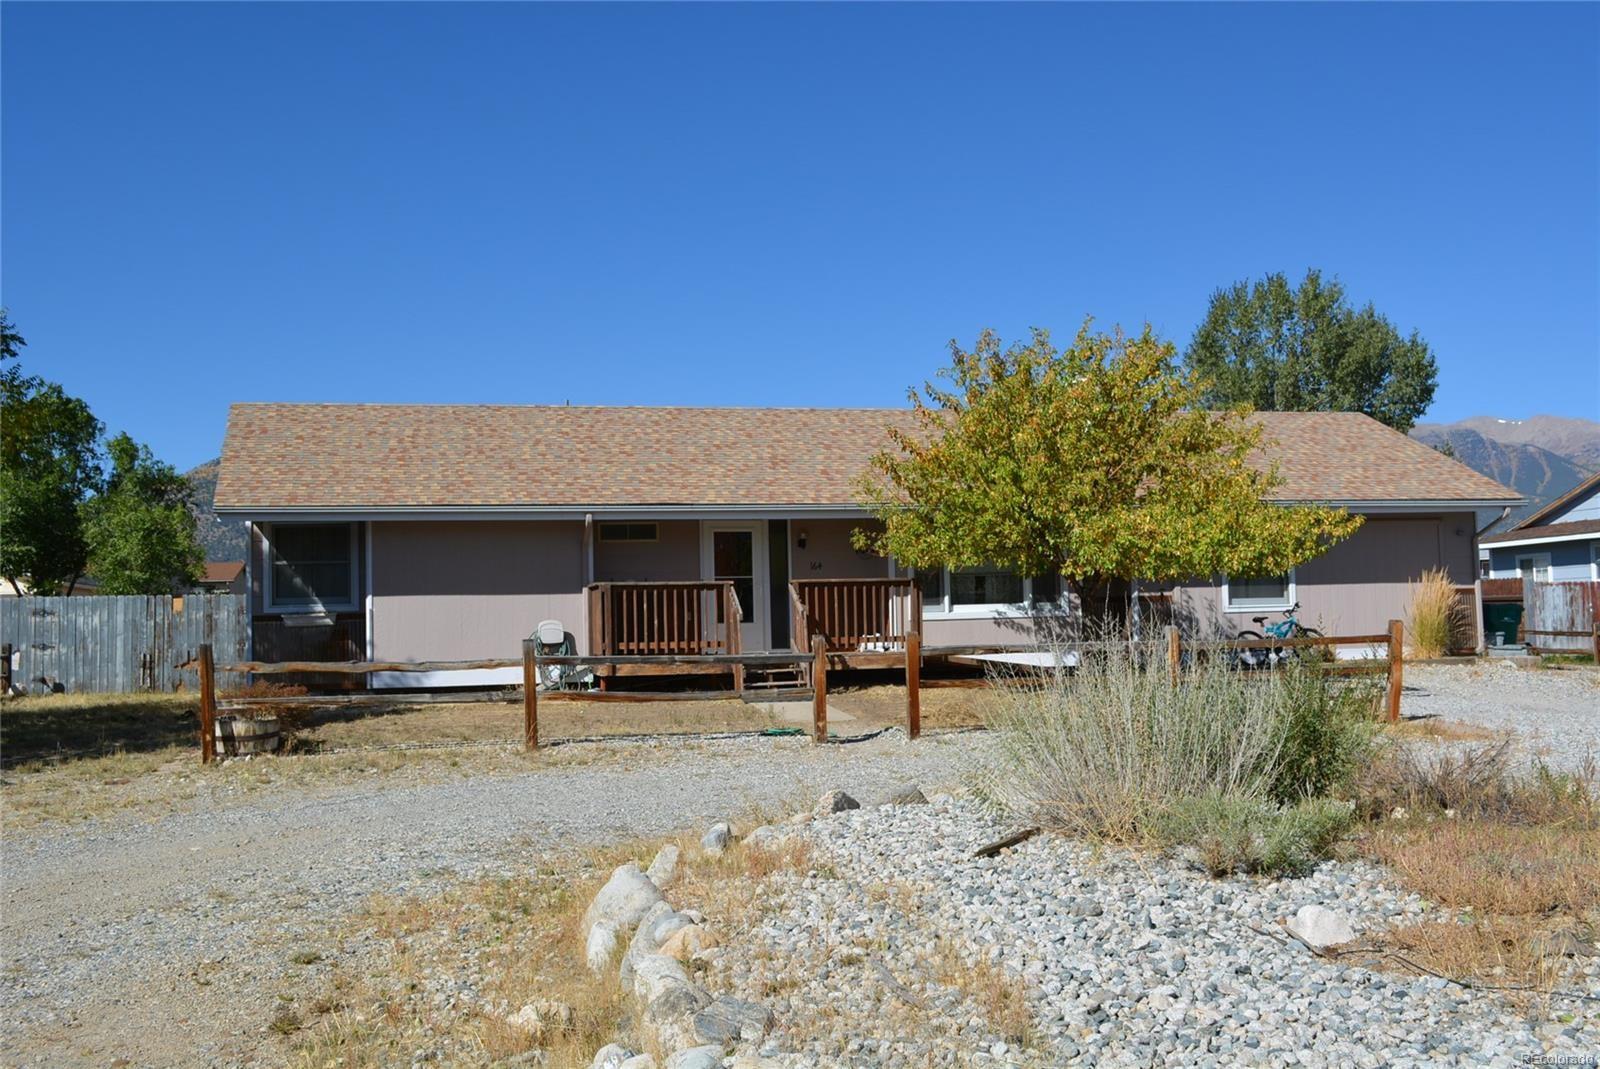 MLS# 1540490 - 3 - 164 Raymond Lee Drive, Buena Vista, CO 81211